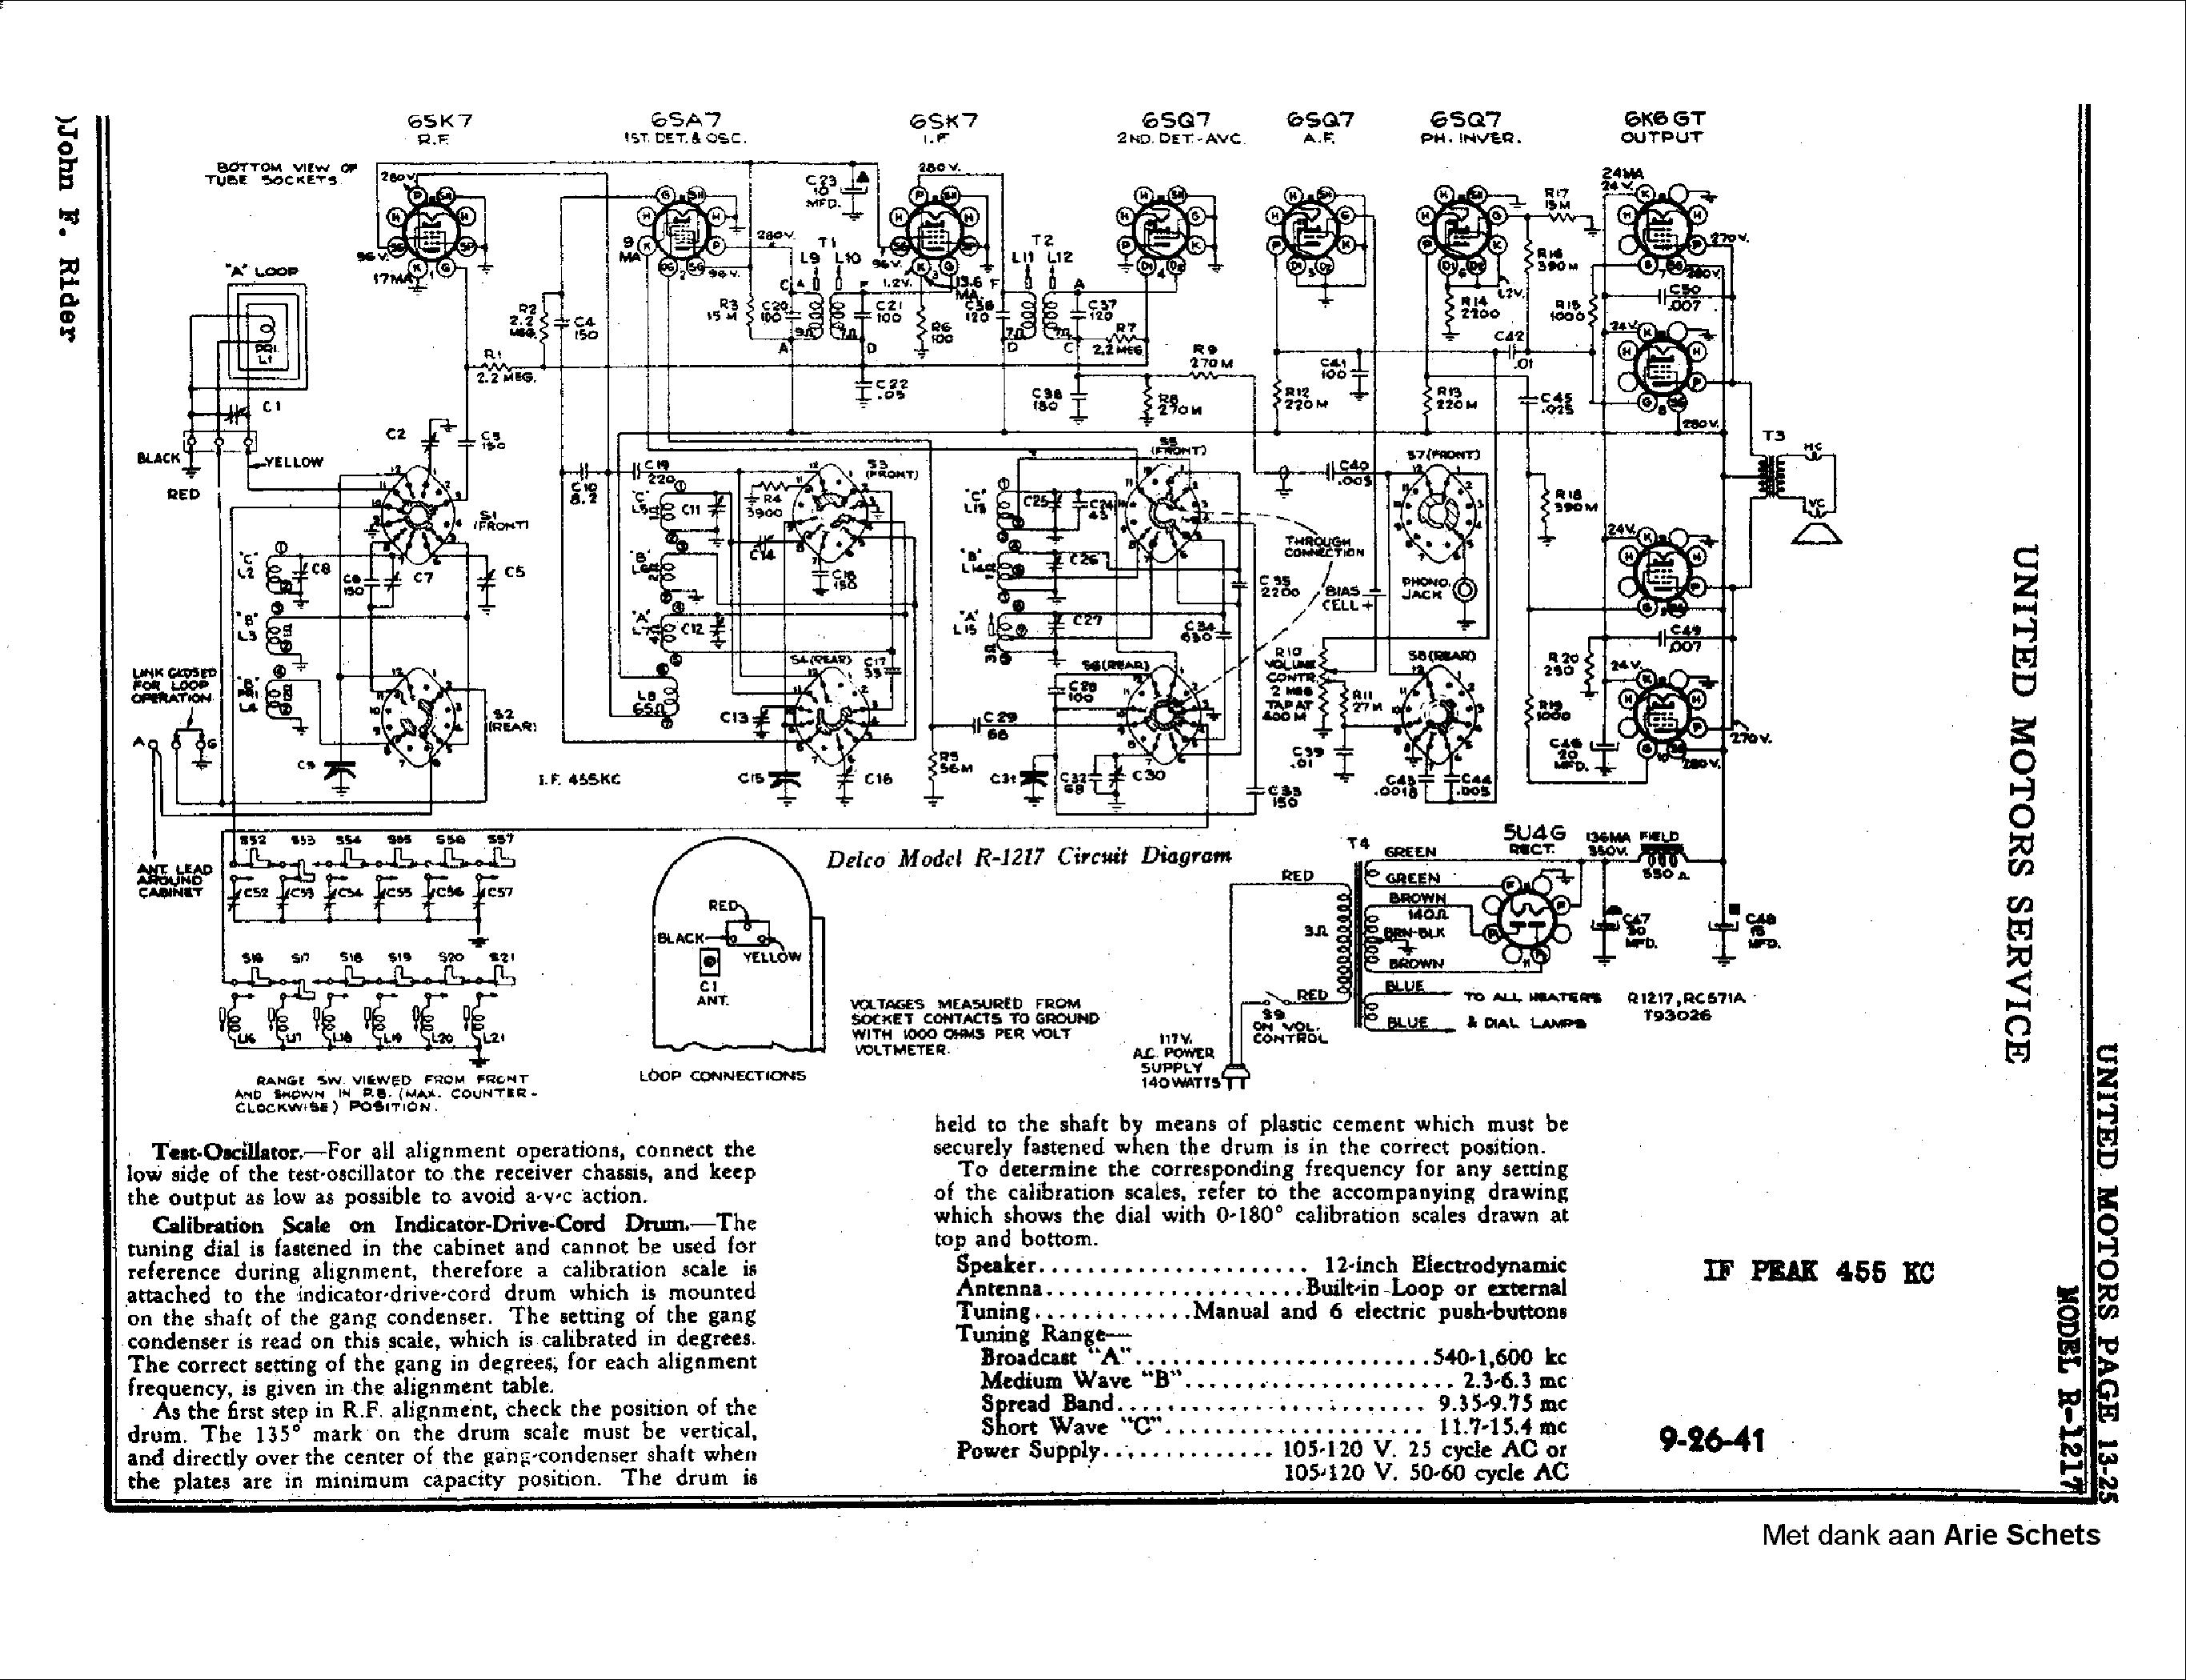 Delphi Delco Electronics Wiring Diagram 21002356